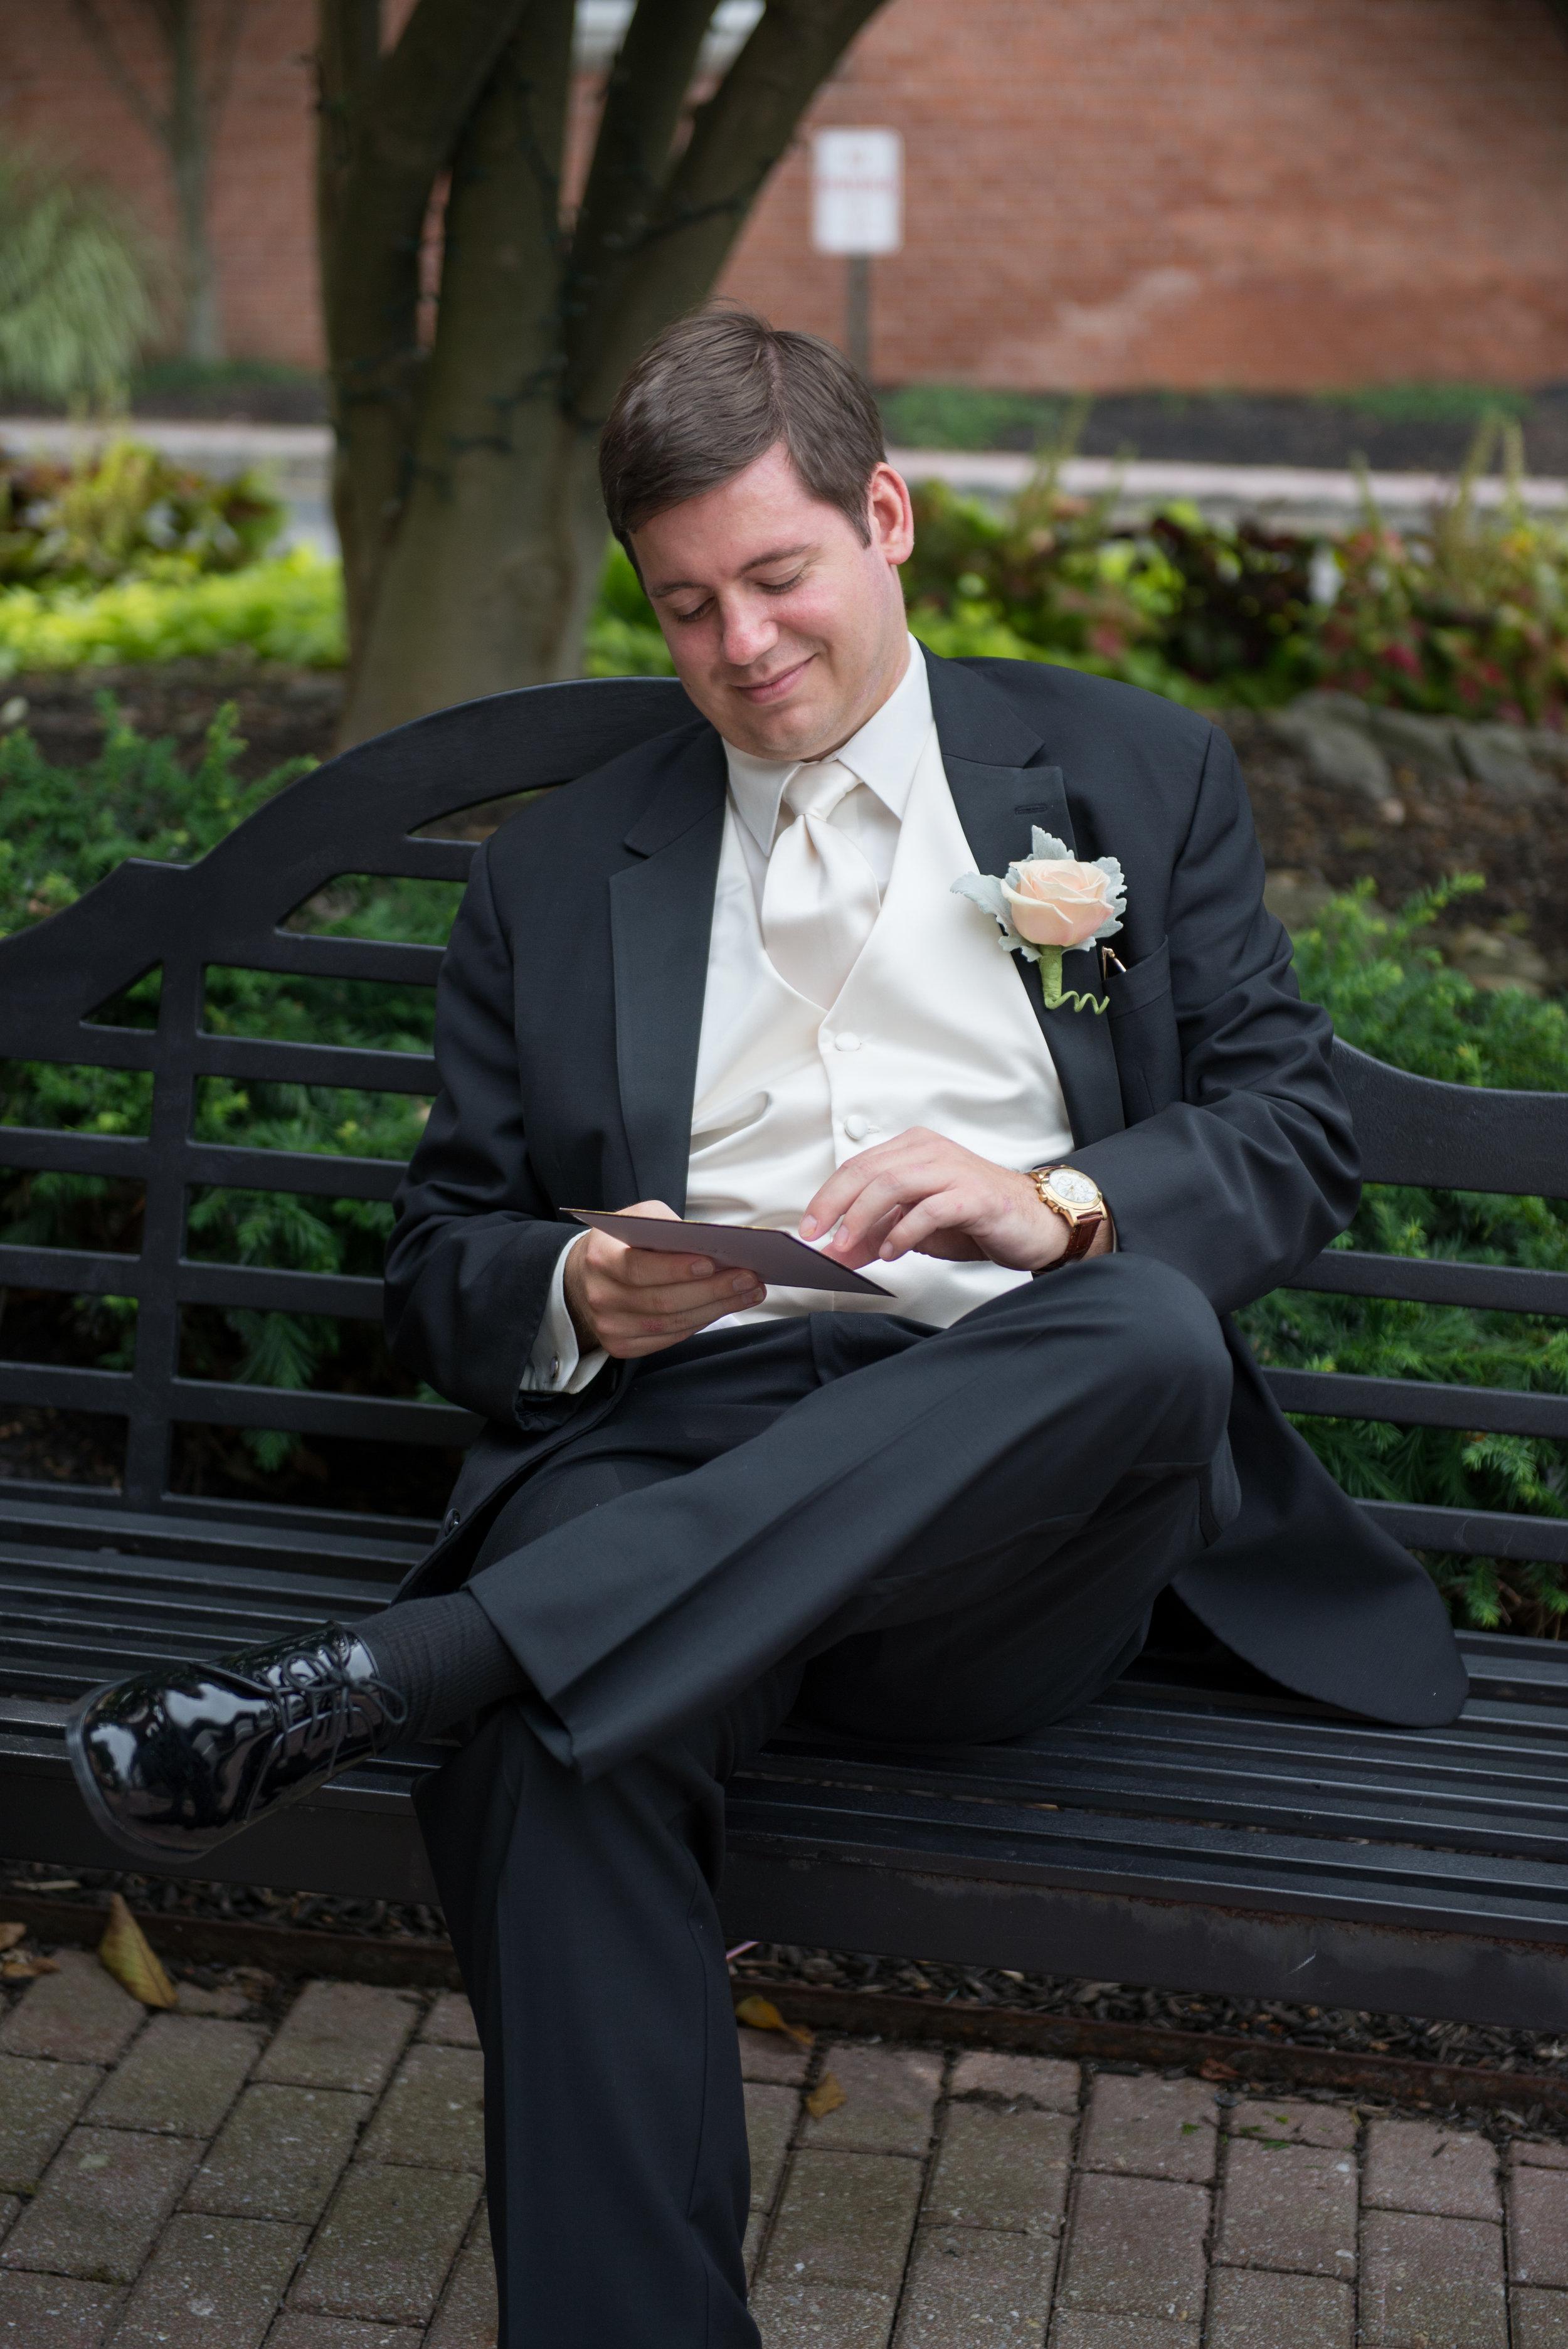 Wedding First Look Photos00888.jpg